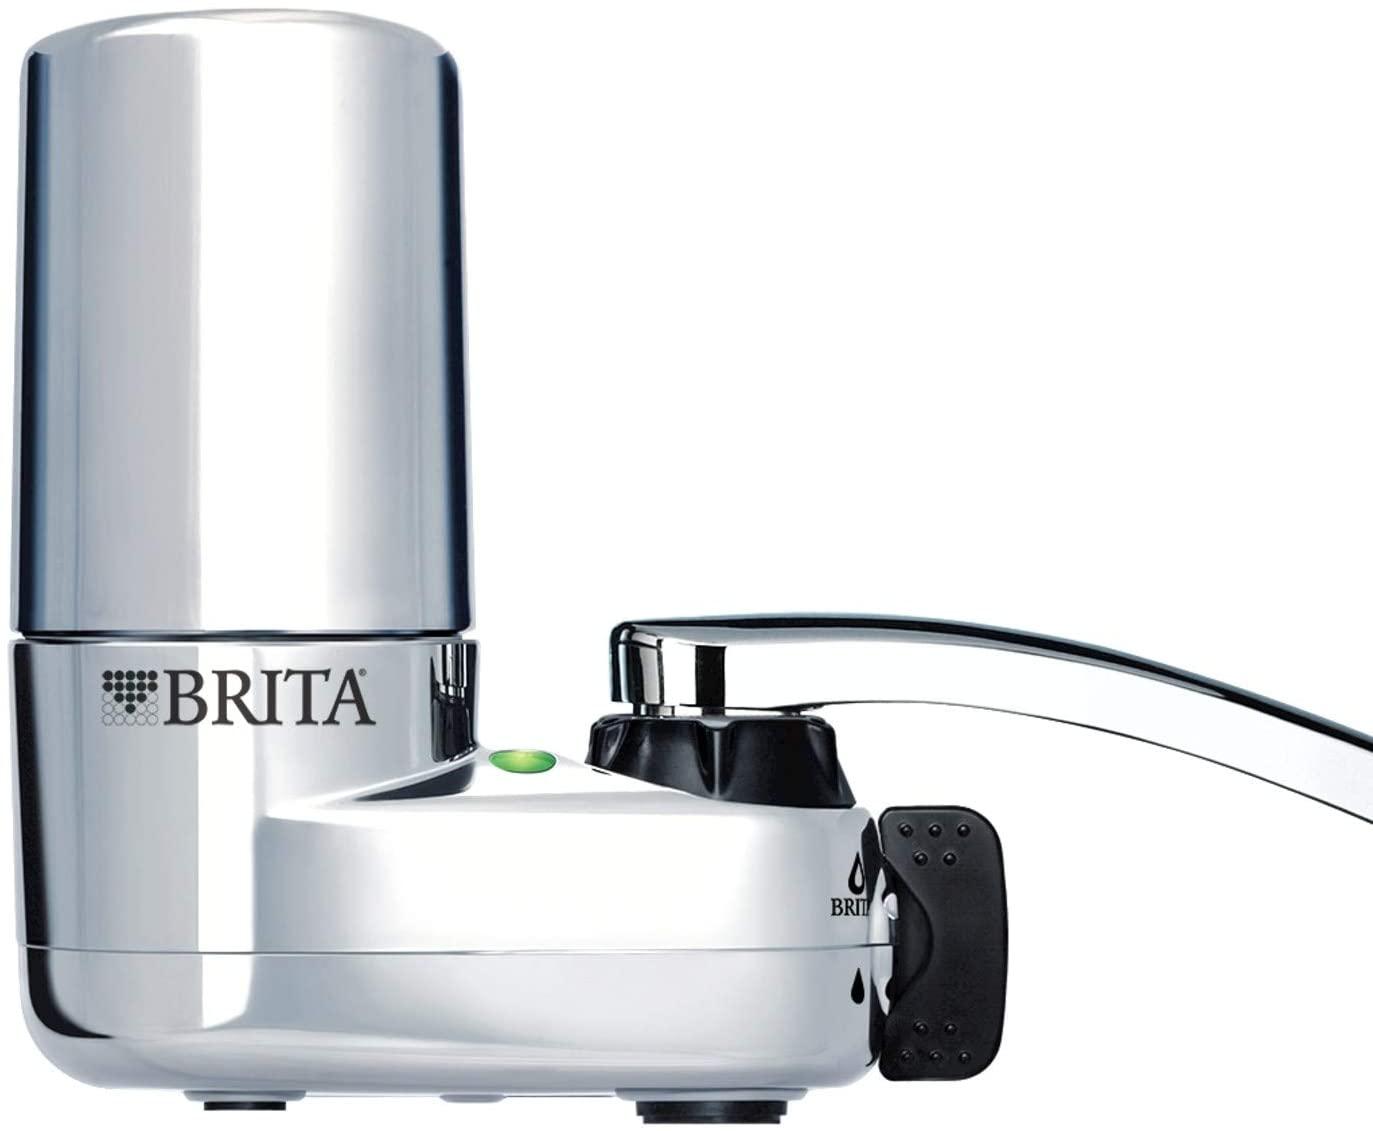 Brita Tap Water Faucet Filtration System